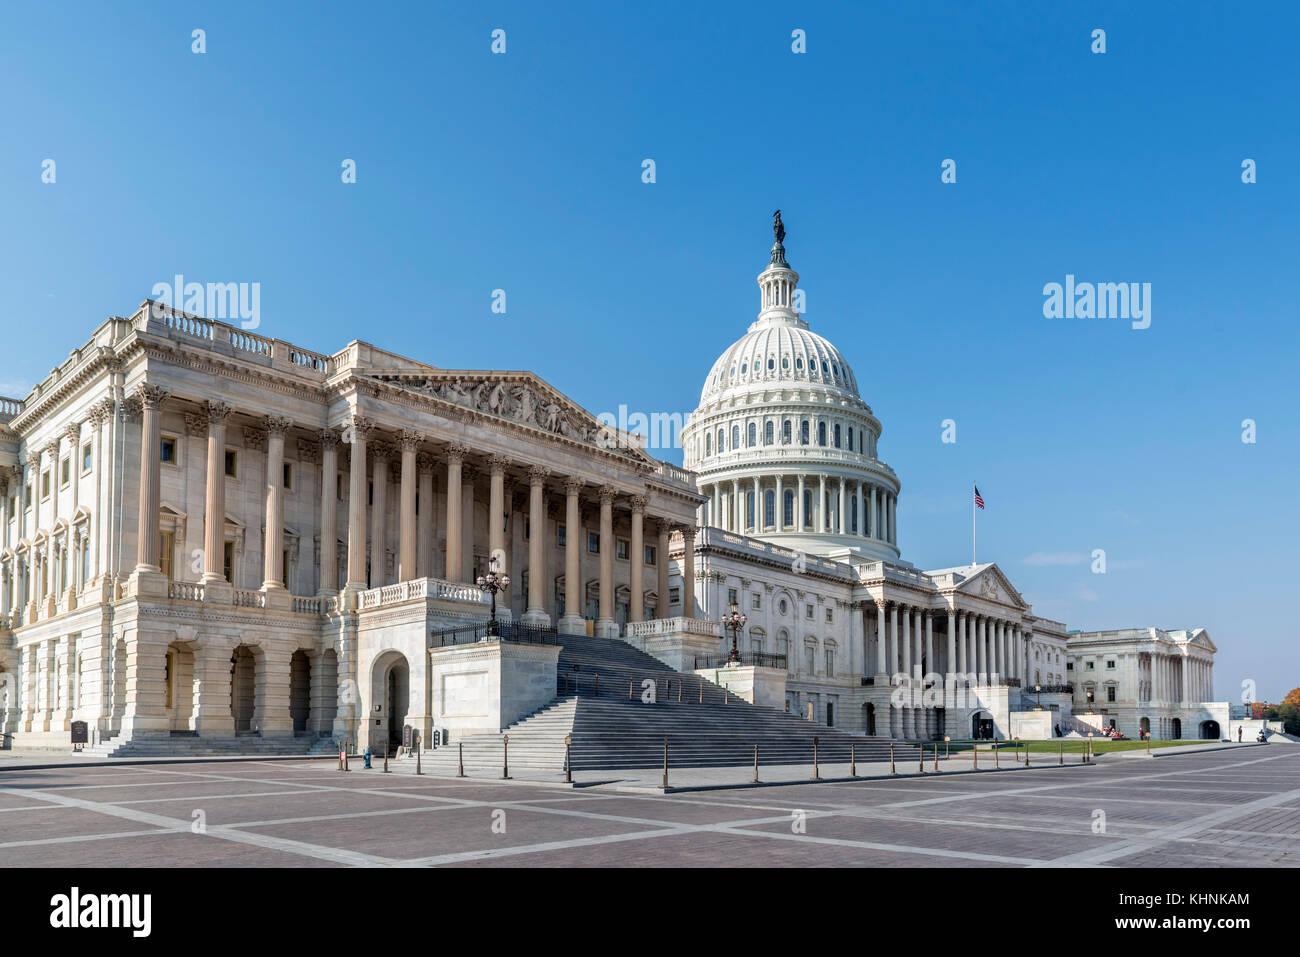 Osten Fassade des United States Capitol, Washington DC, USA Stockbild